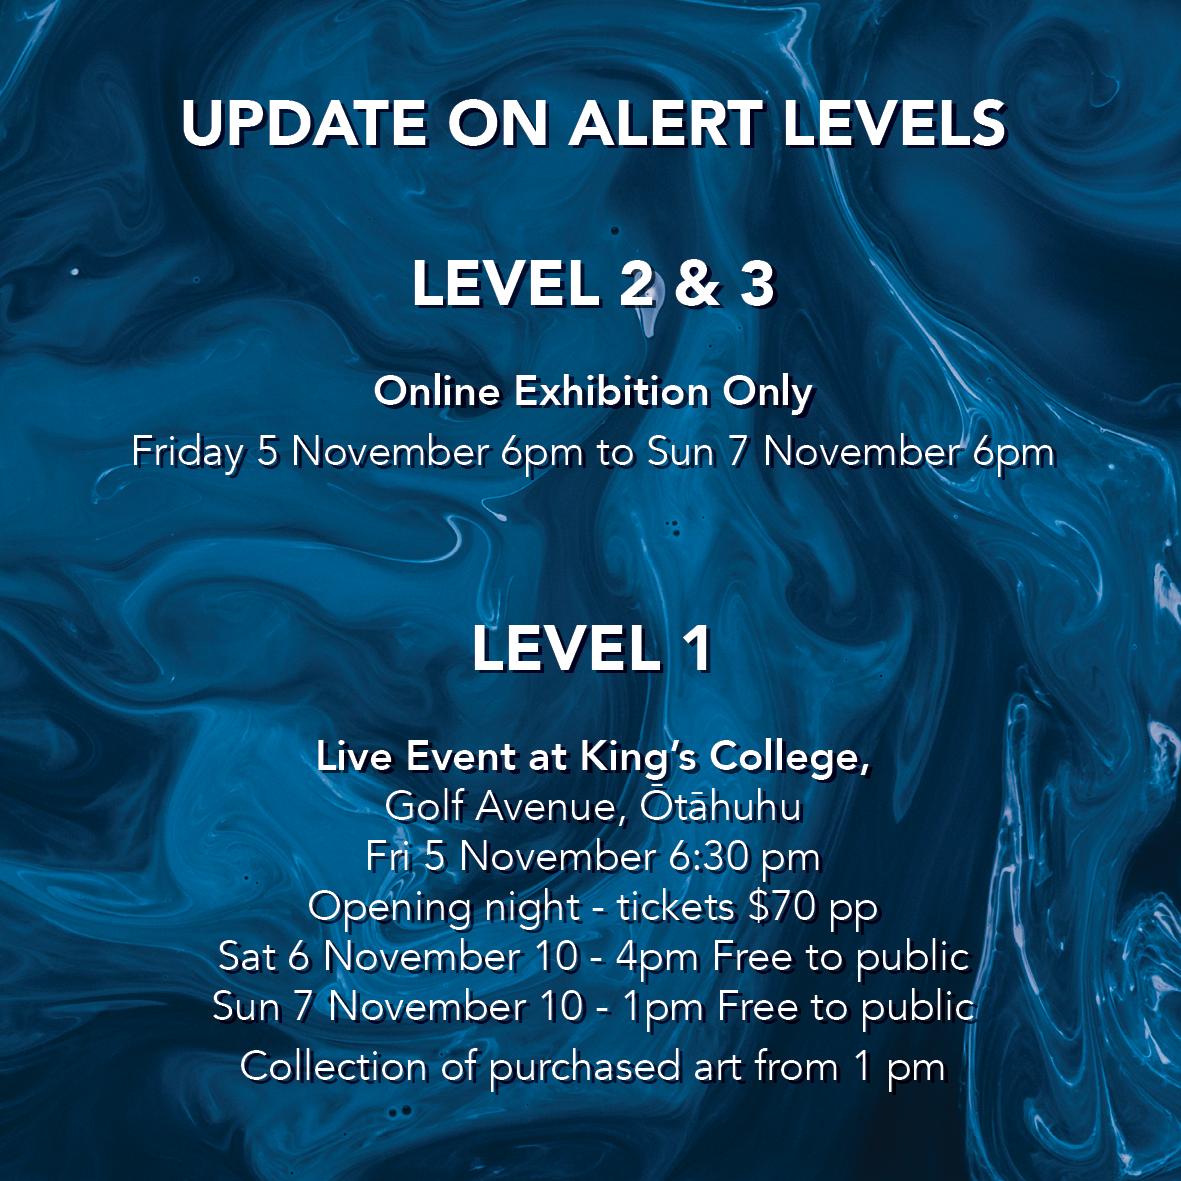 Alert Level Update Web